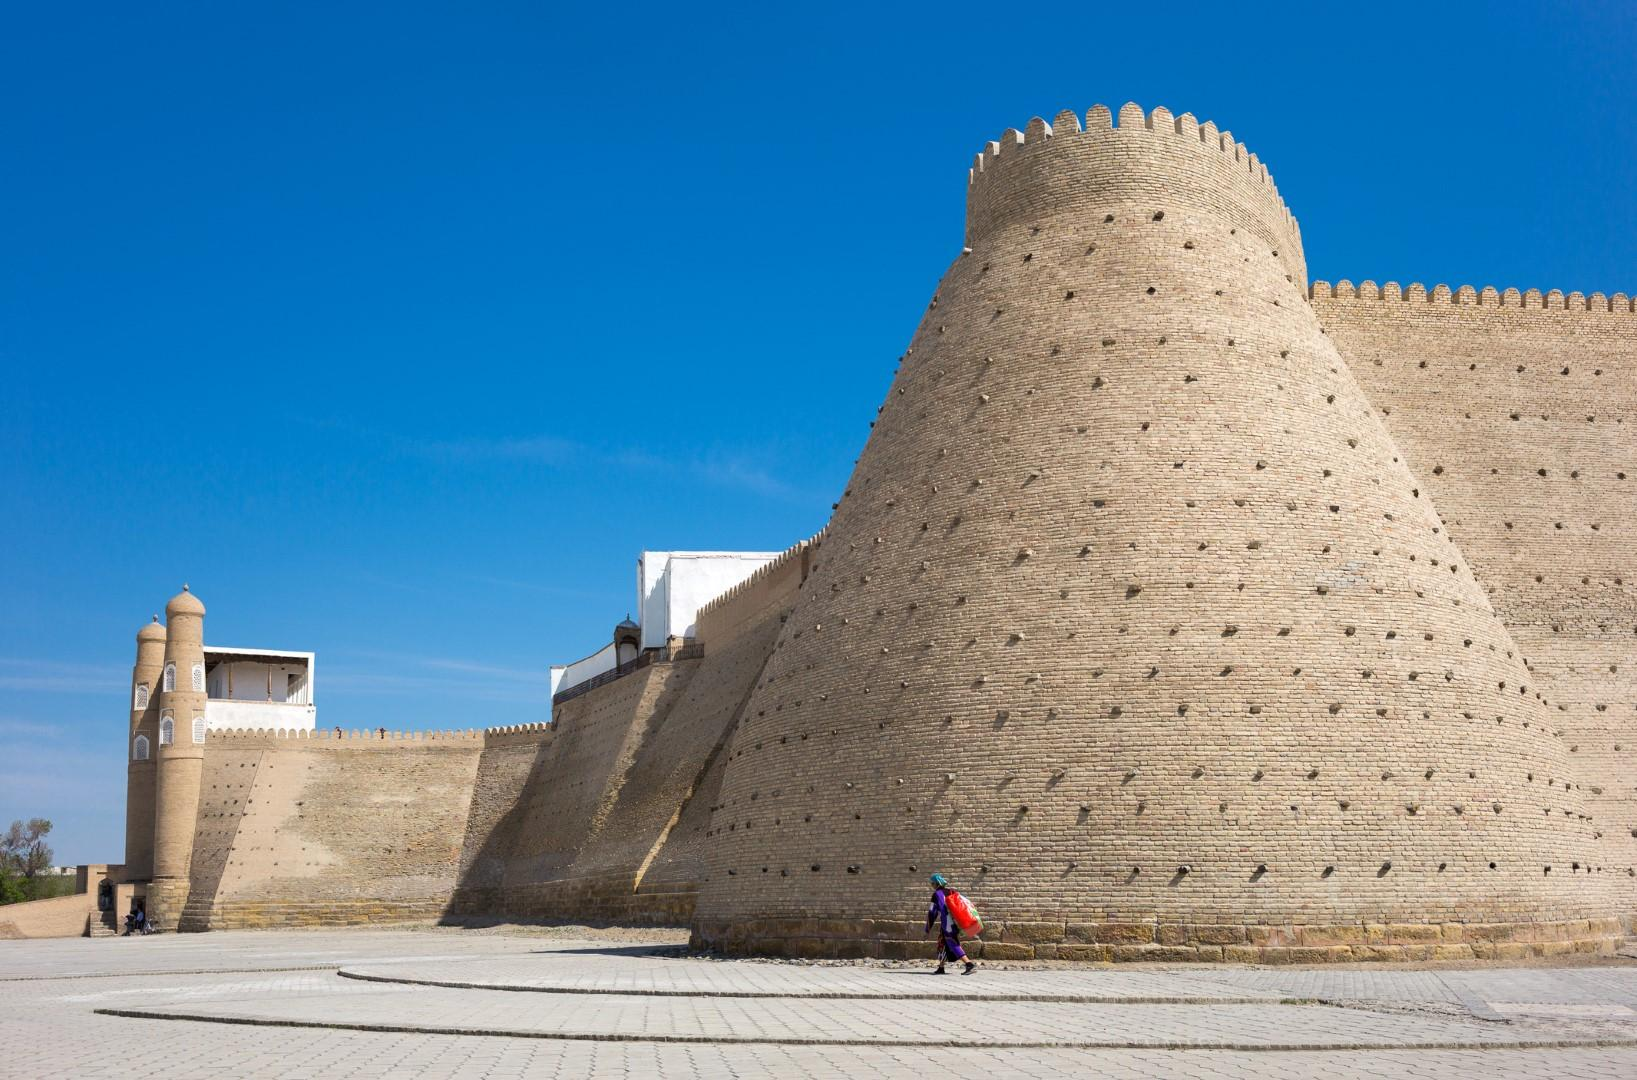 Uzbekistan, mitico paese delle Vie della Seta